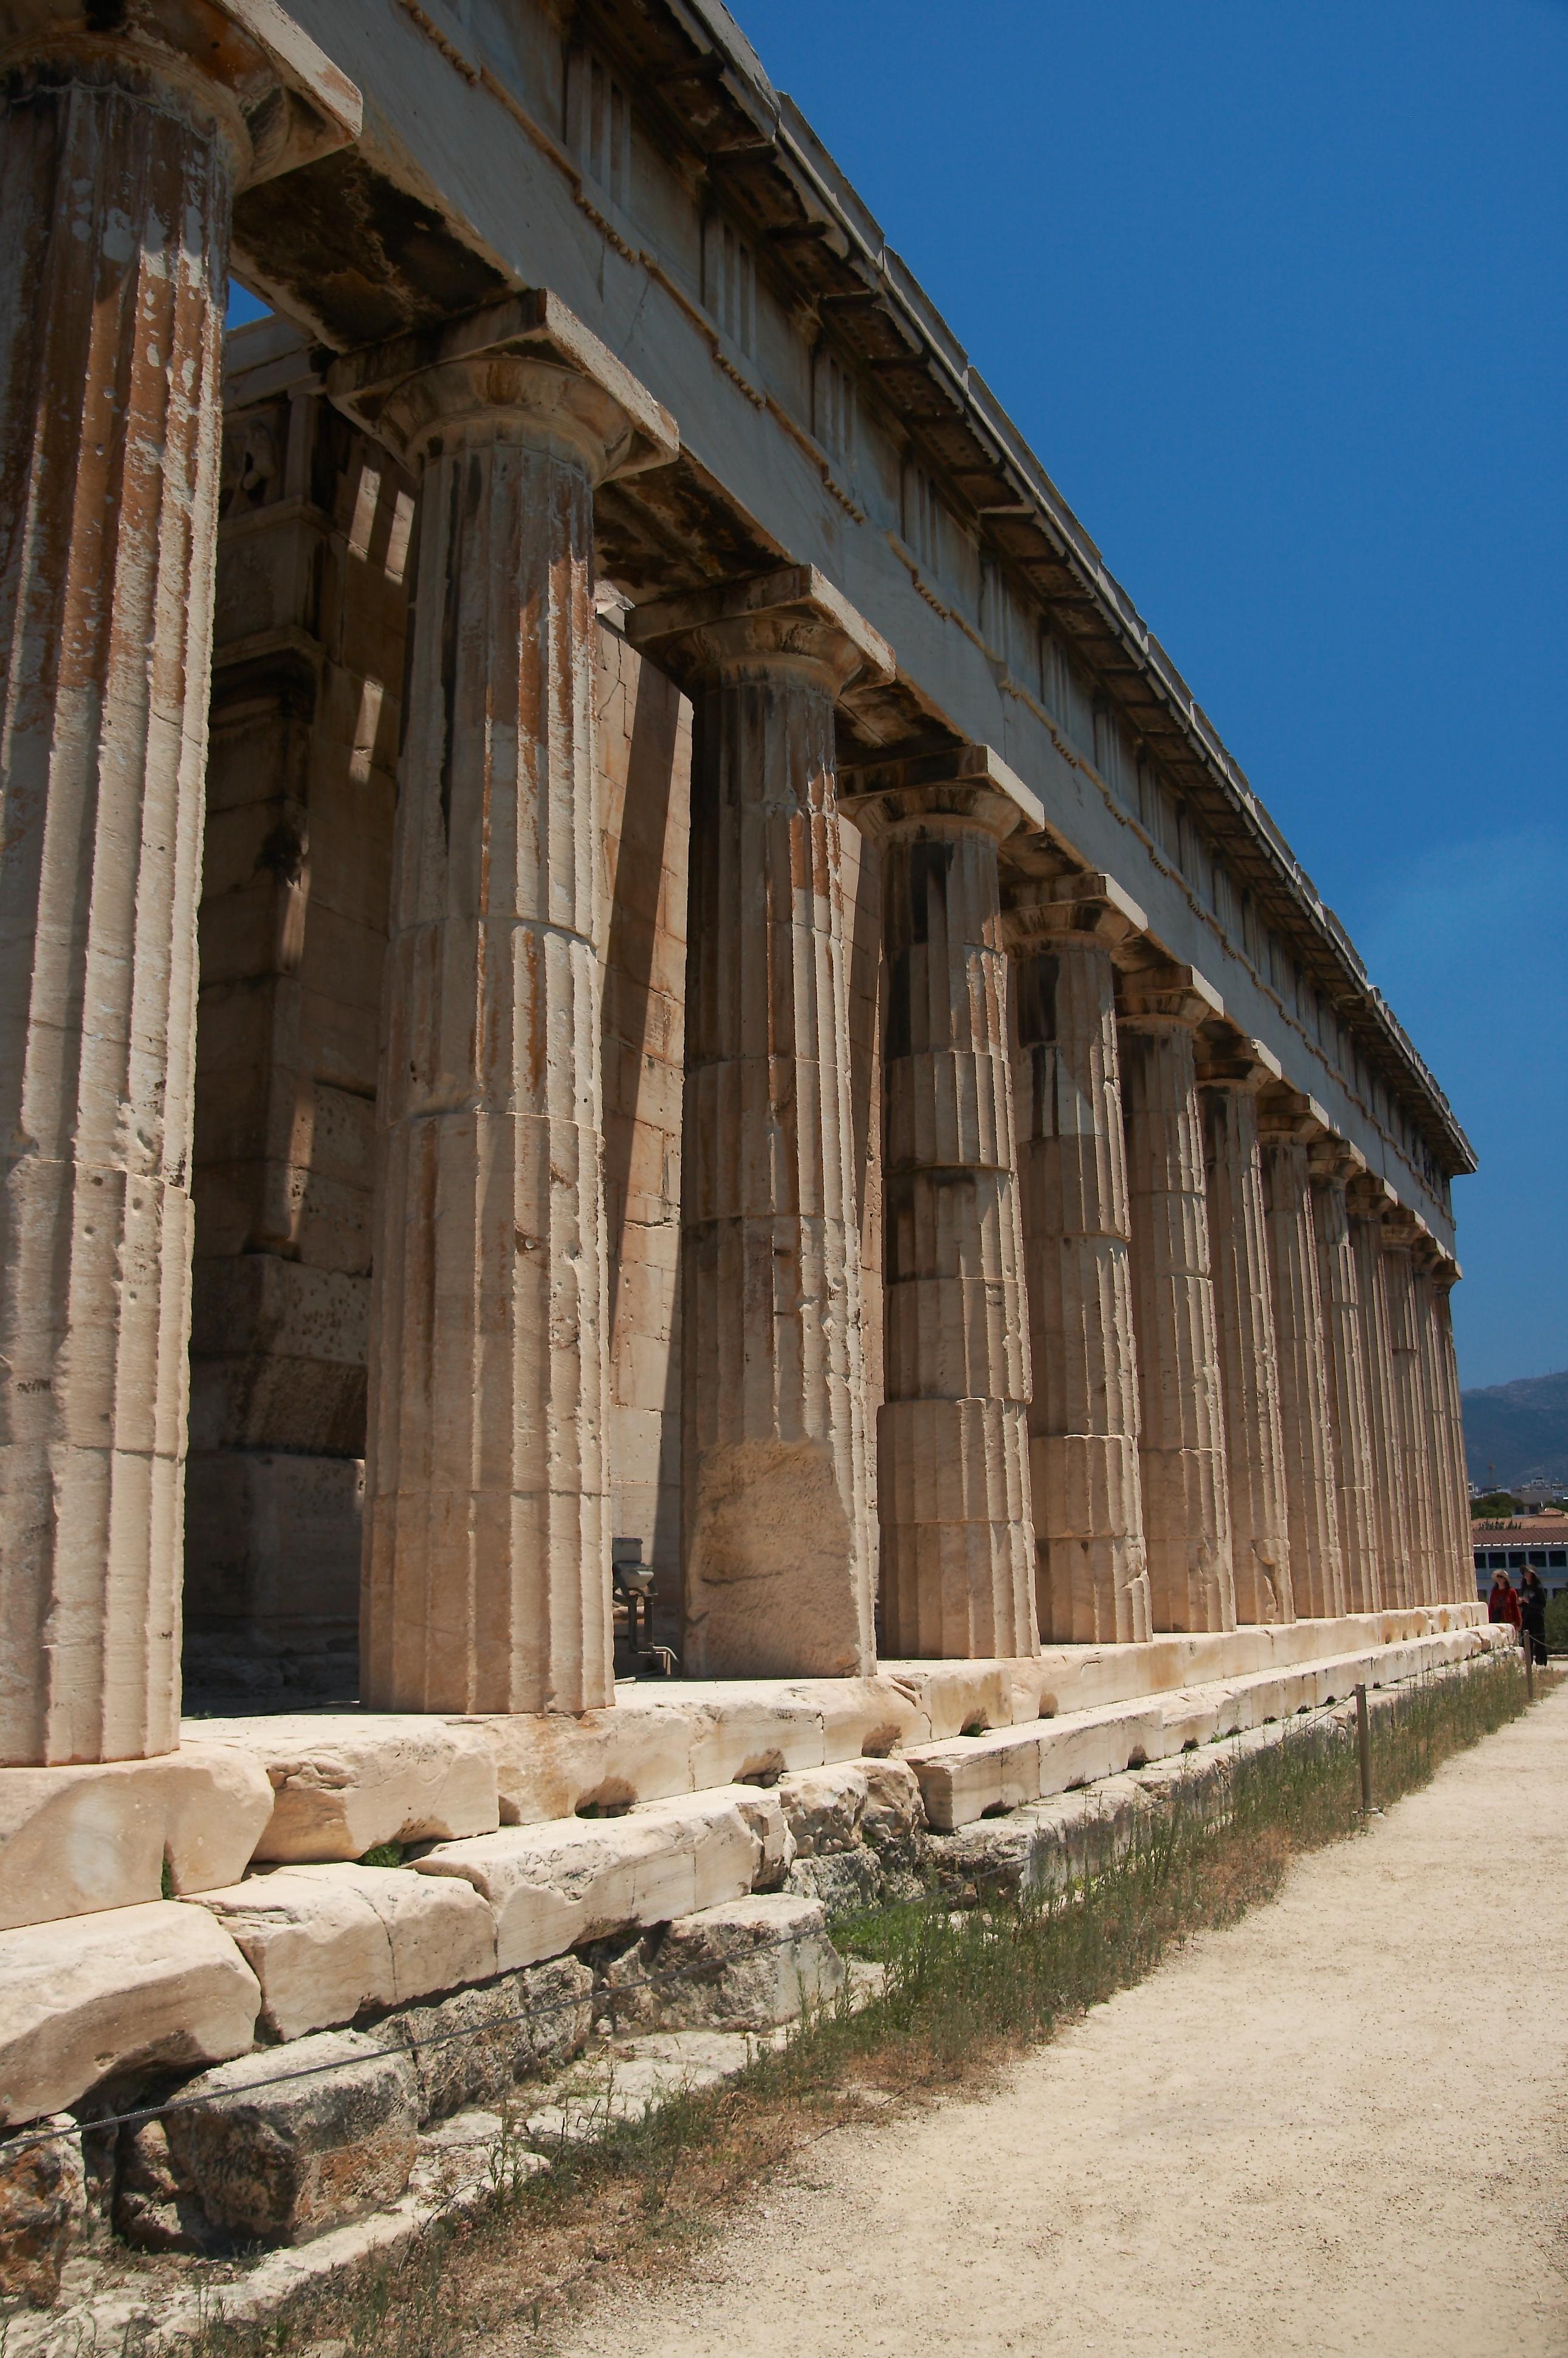 File:Temple of Hephaestus (South), Athens - 20070711.jpg ...